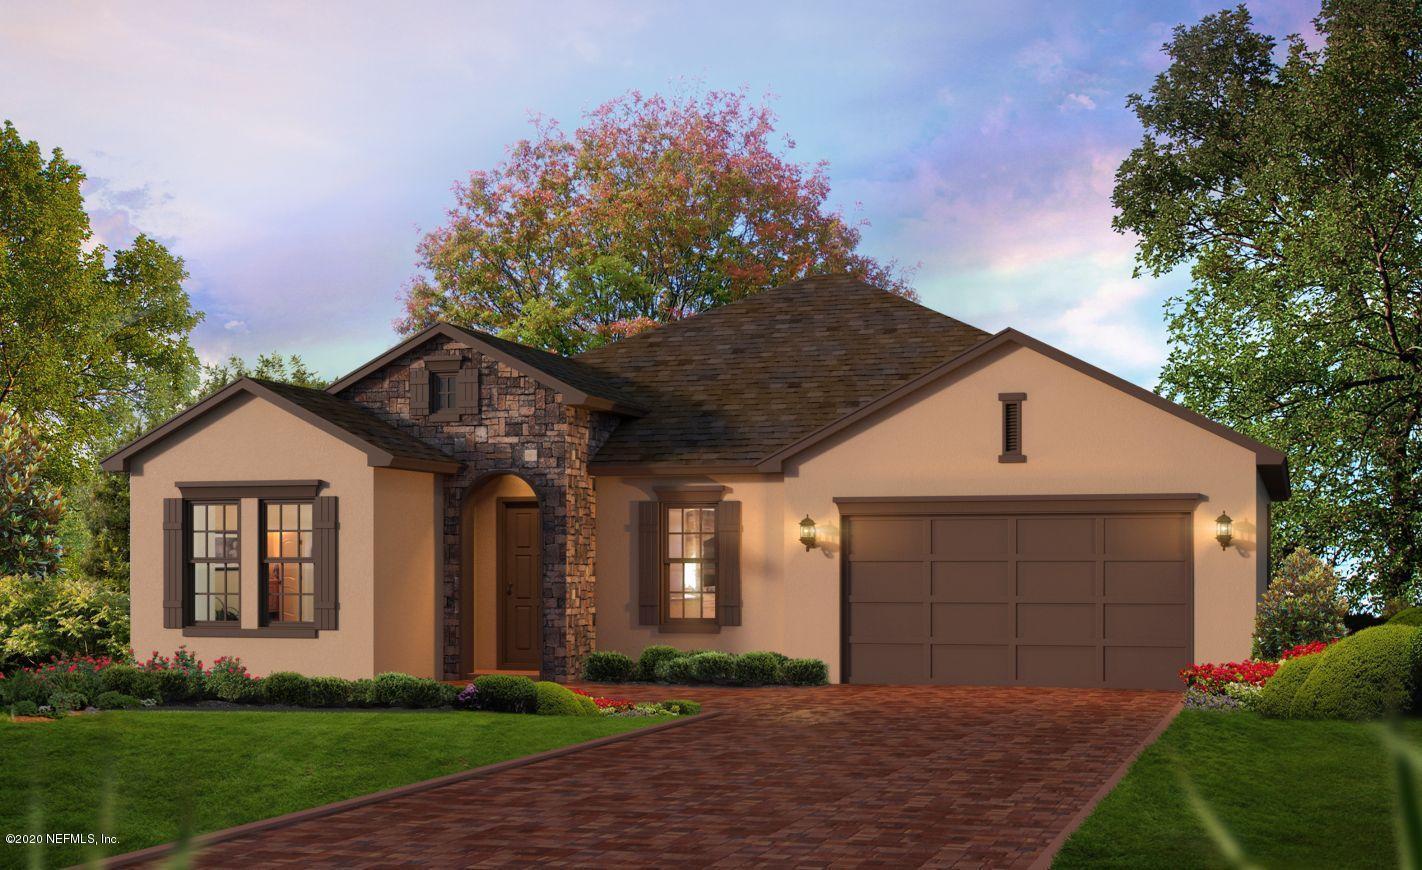 2549 CAPRERA, JACKSONVILLE, FLORIDA 32246, 3 Bedrooms Bedrooms, ,2 BathroomsBathrooms,Residential,For sale,CAPRERA,1054786